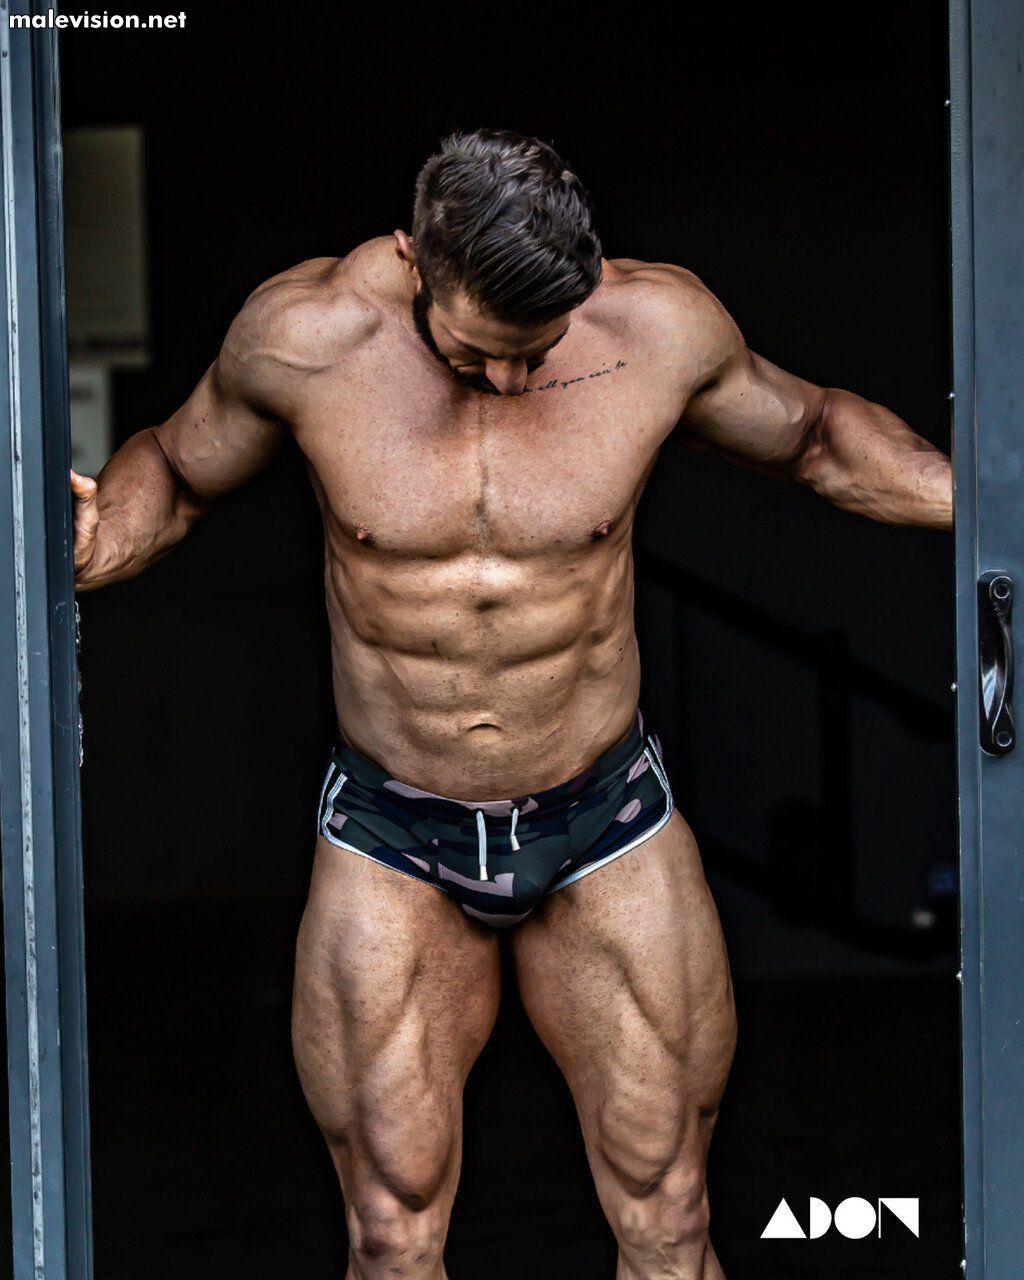 David Lurs21 - Male Models - AdonisMale